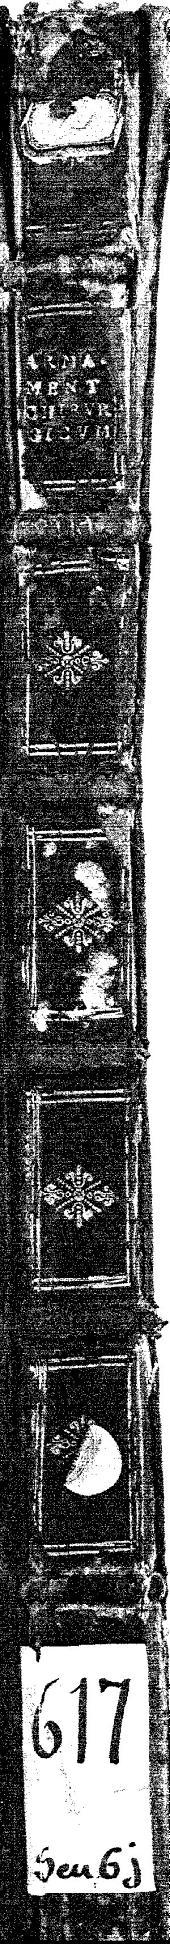 Cheirhoplotheke seu D. Ioannis Sculteti ... Armamentarium chirurgicum XLIII tabulis aeri elegantissime incissis ... exornatus: opus posthumum ...